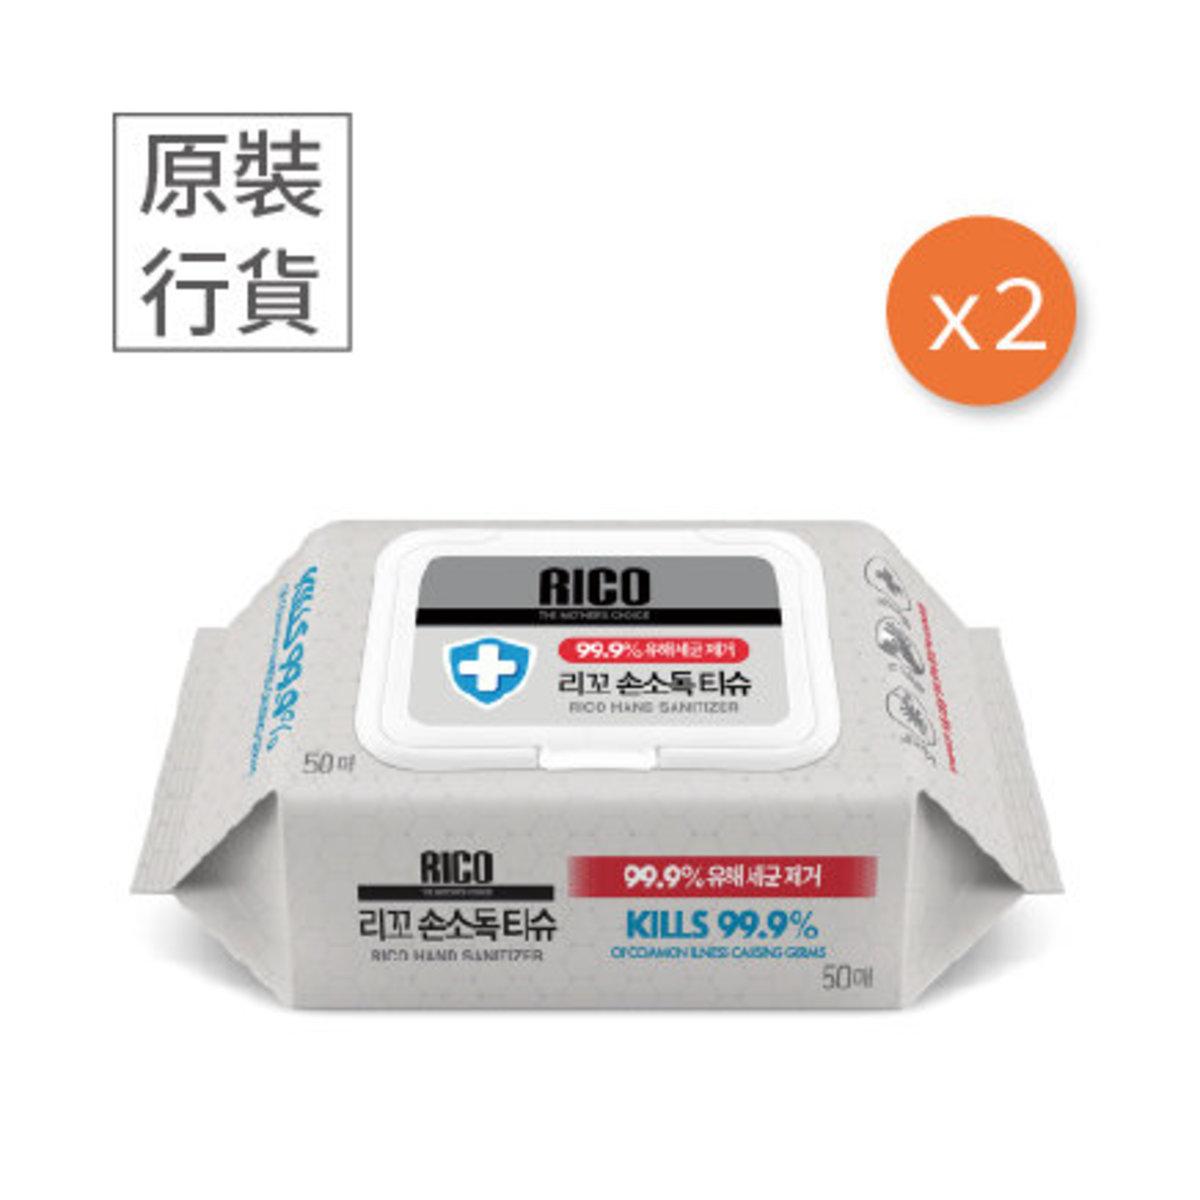 Rico 99.9% 消毒濕紙巾 (50片) 2包裝 (原裝行貨)